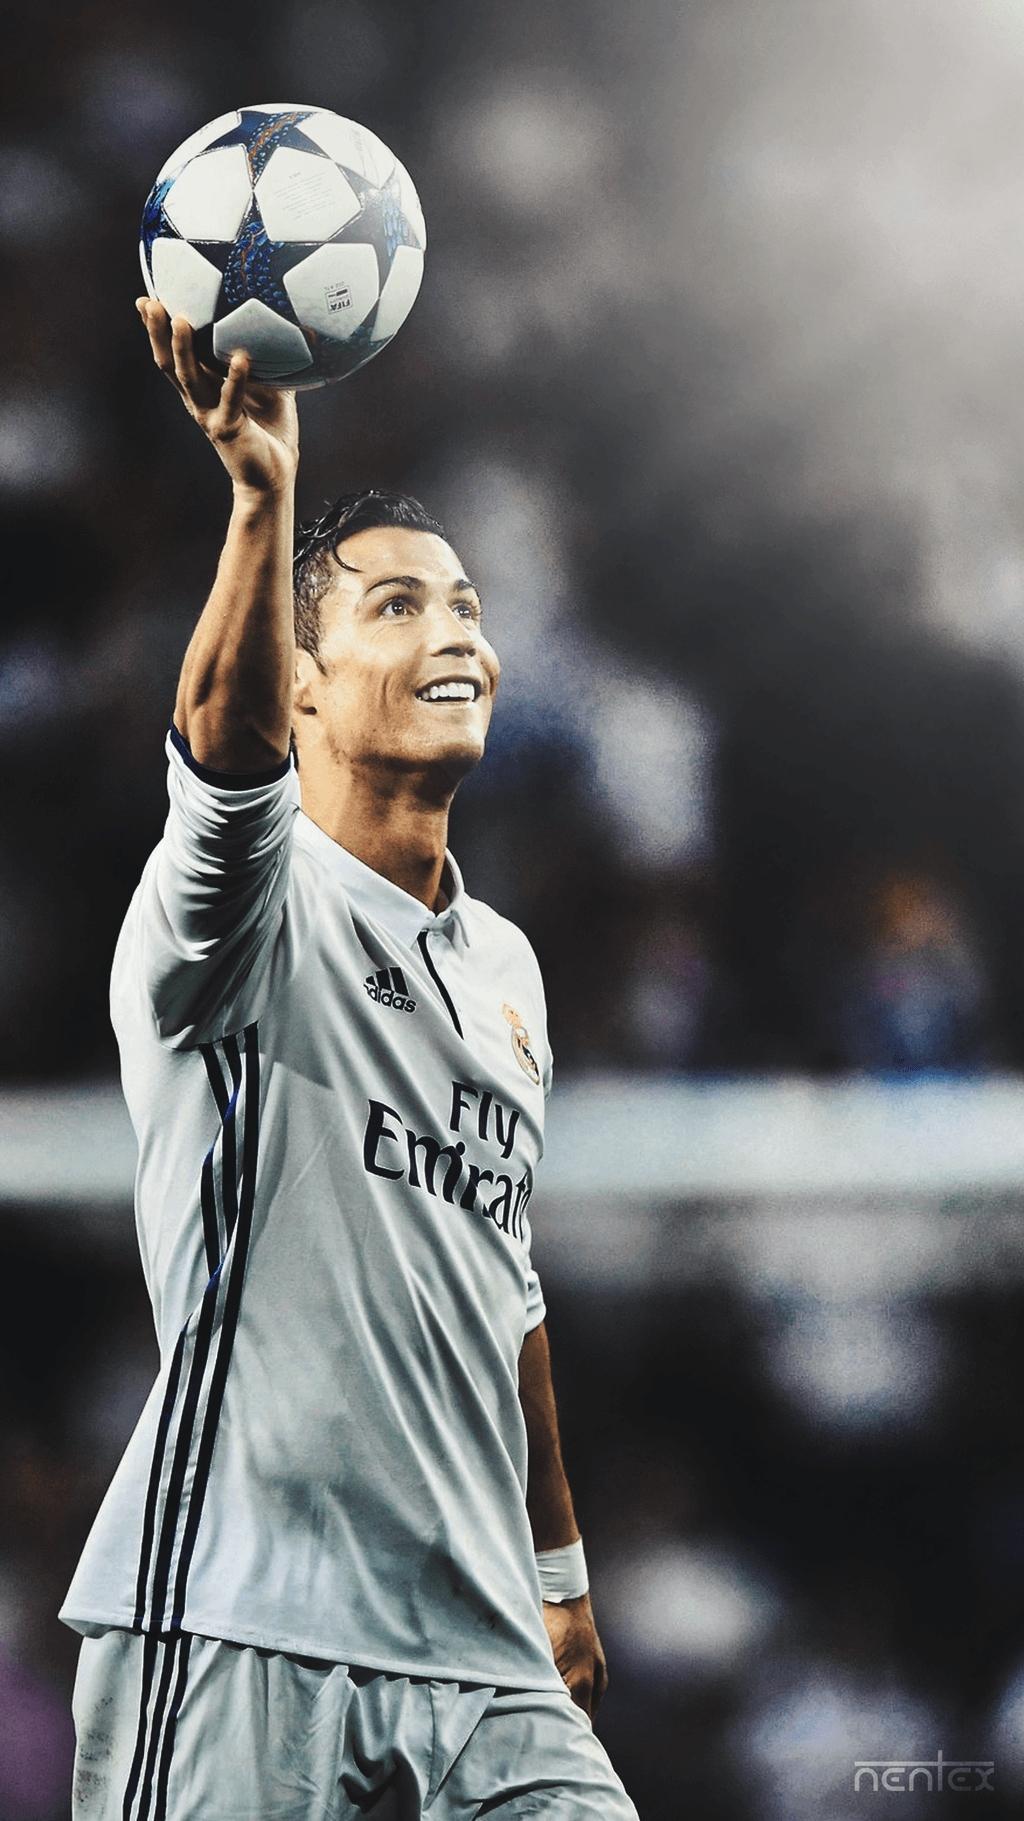 Cristiano Ronaldo 2019 Wallpapers - WallpaperSafari